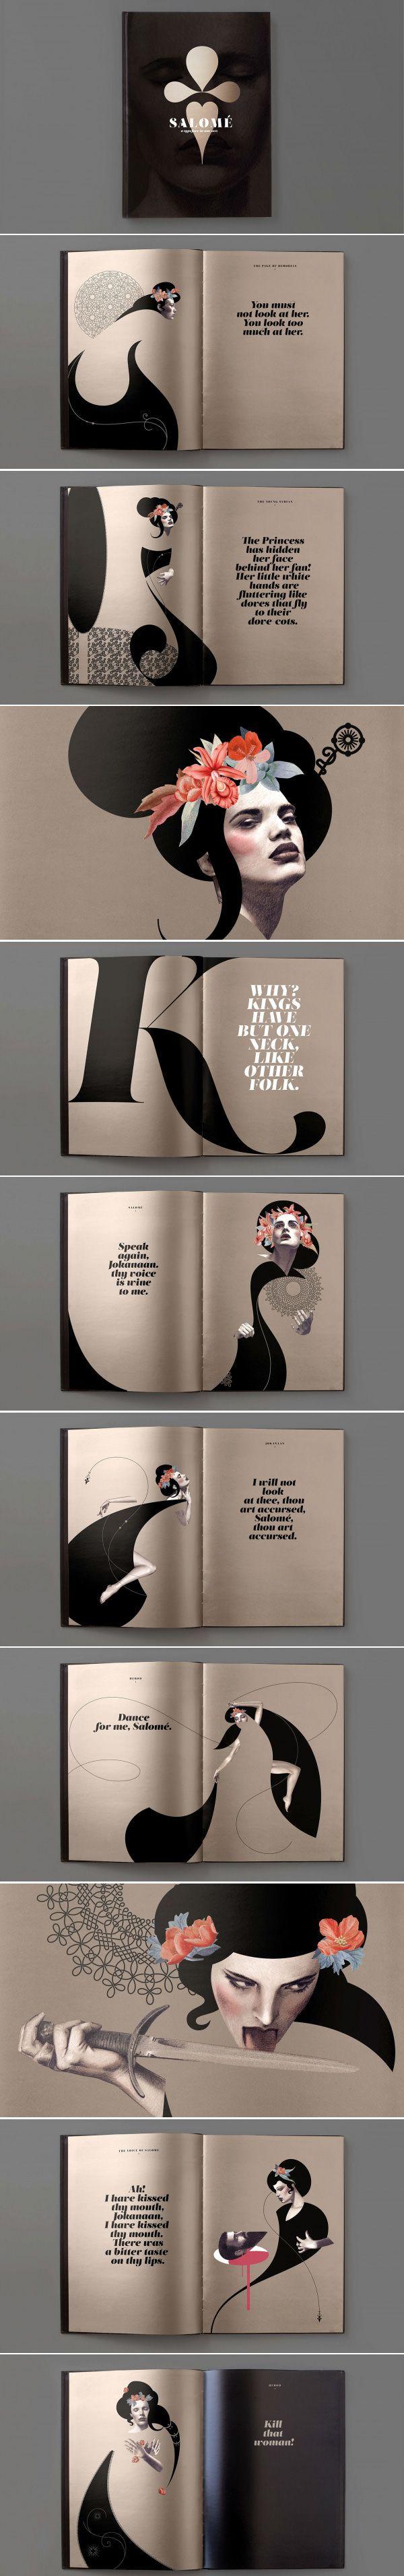 """Salomé Type Specimen Booklet"" by Atipo"